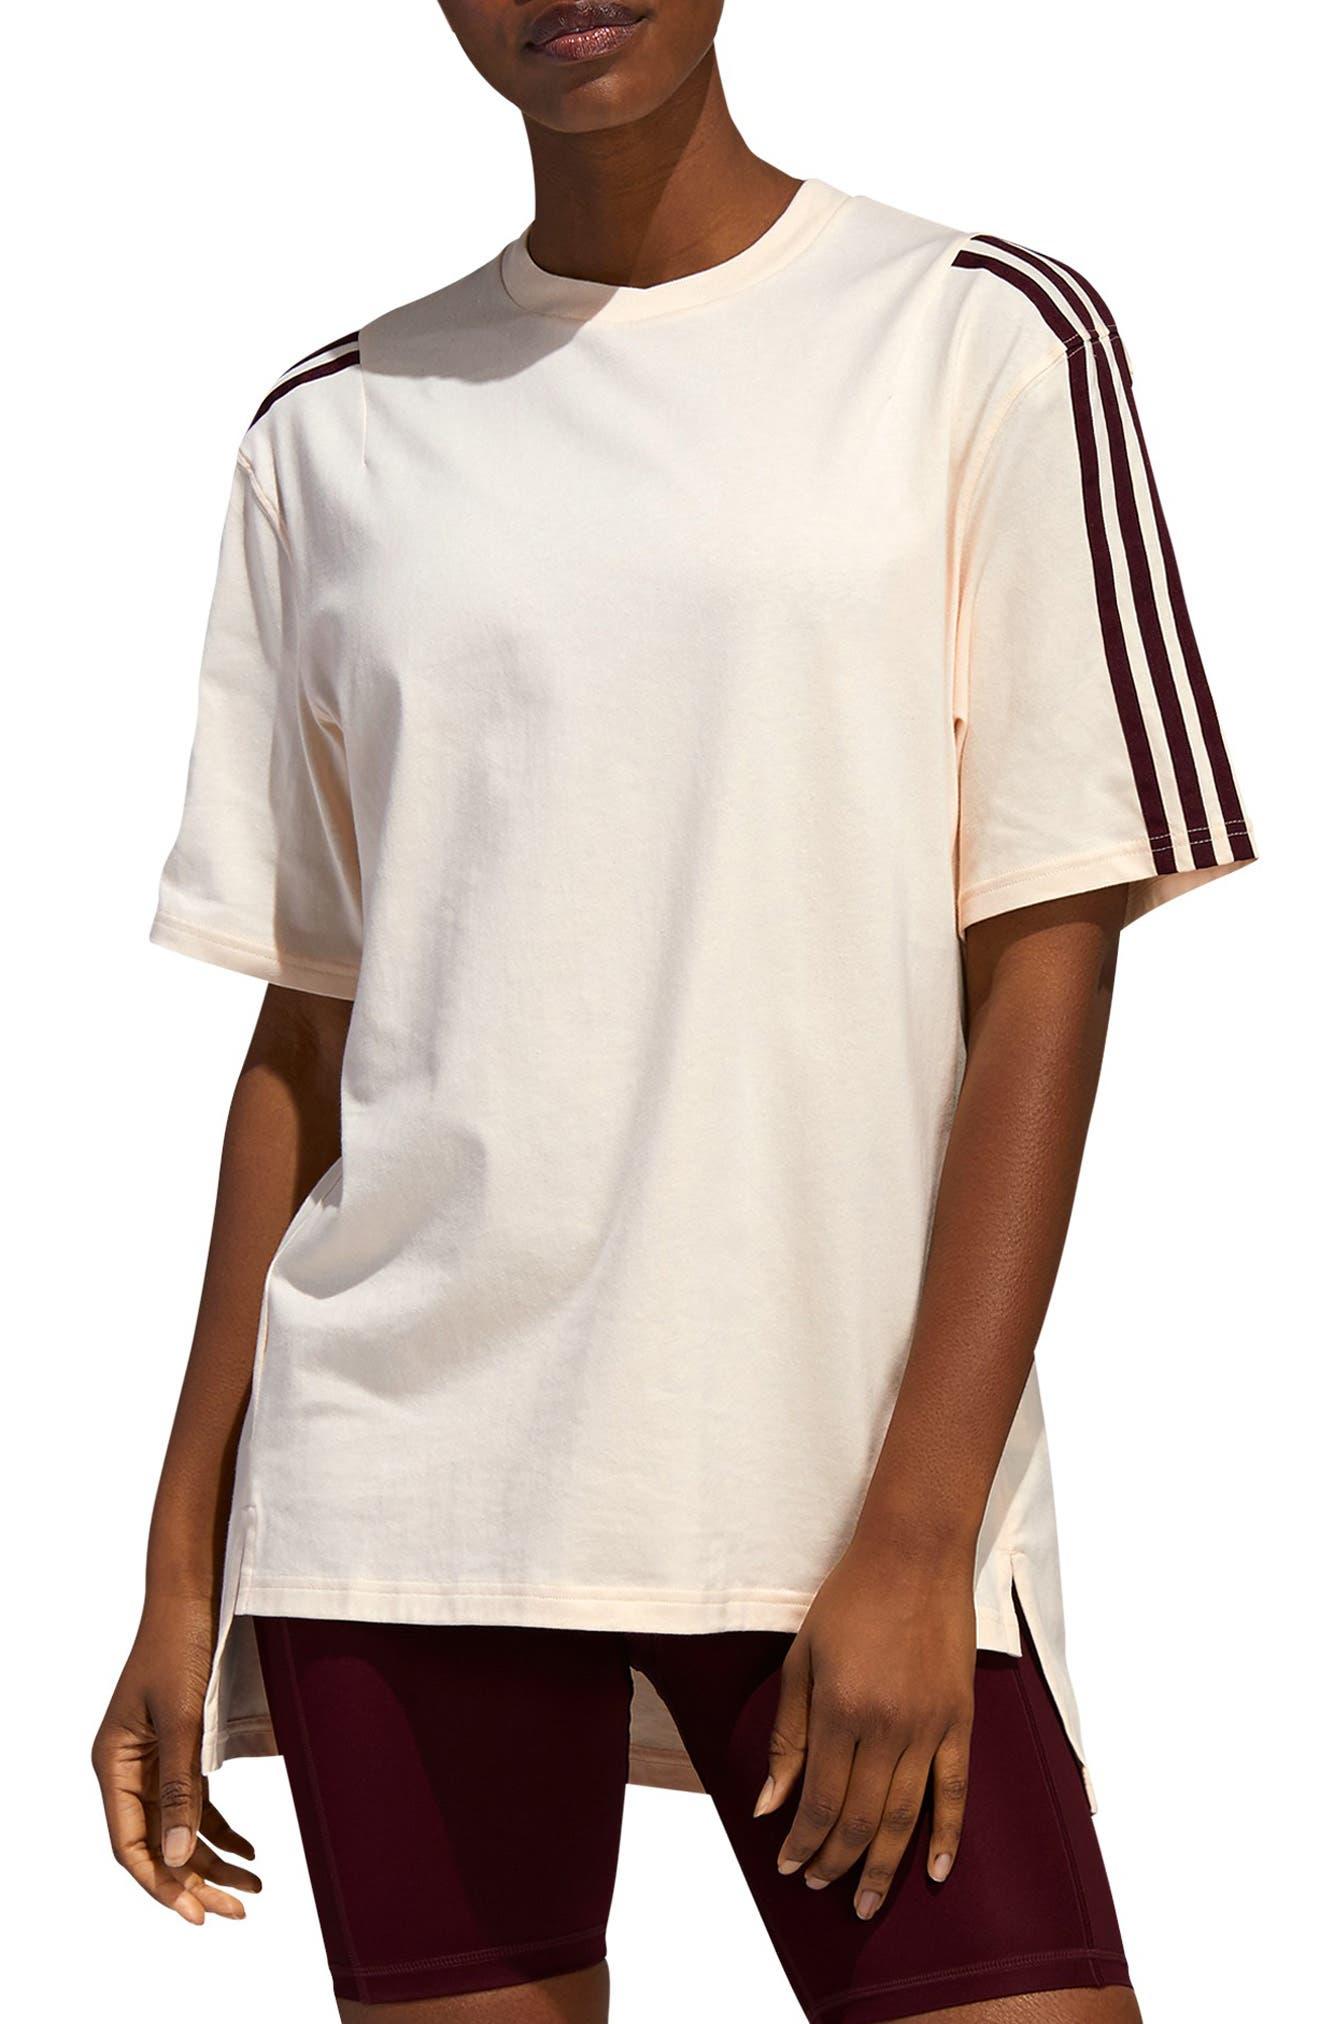 adidas x IVY PARK Oversize T-Shirt